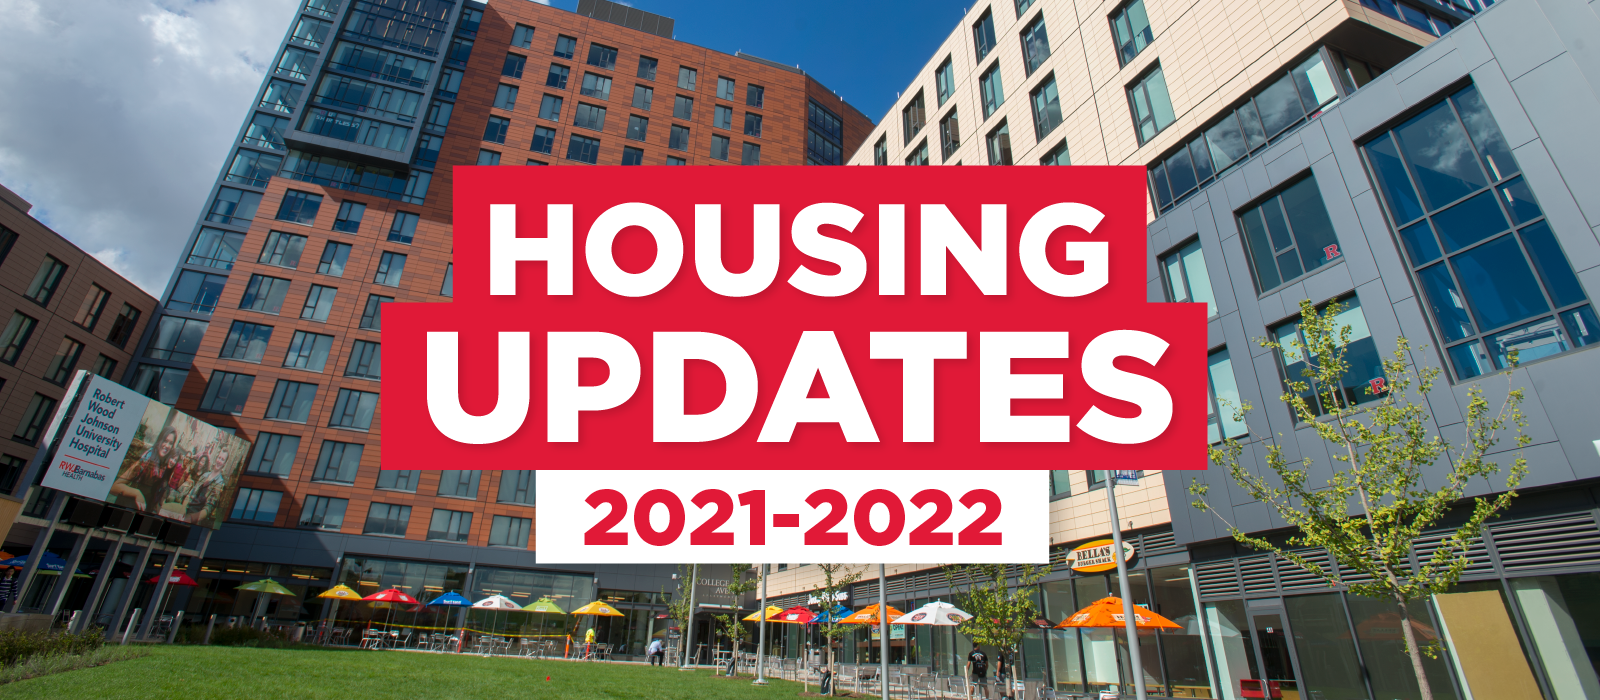 Housing Updates 2021-2022